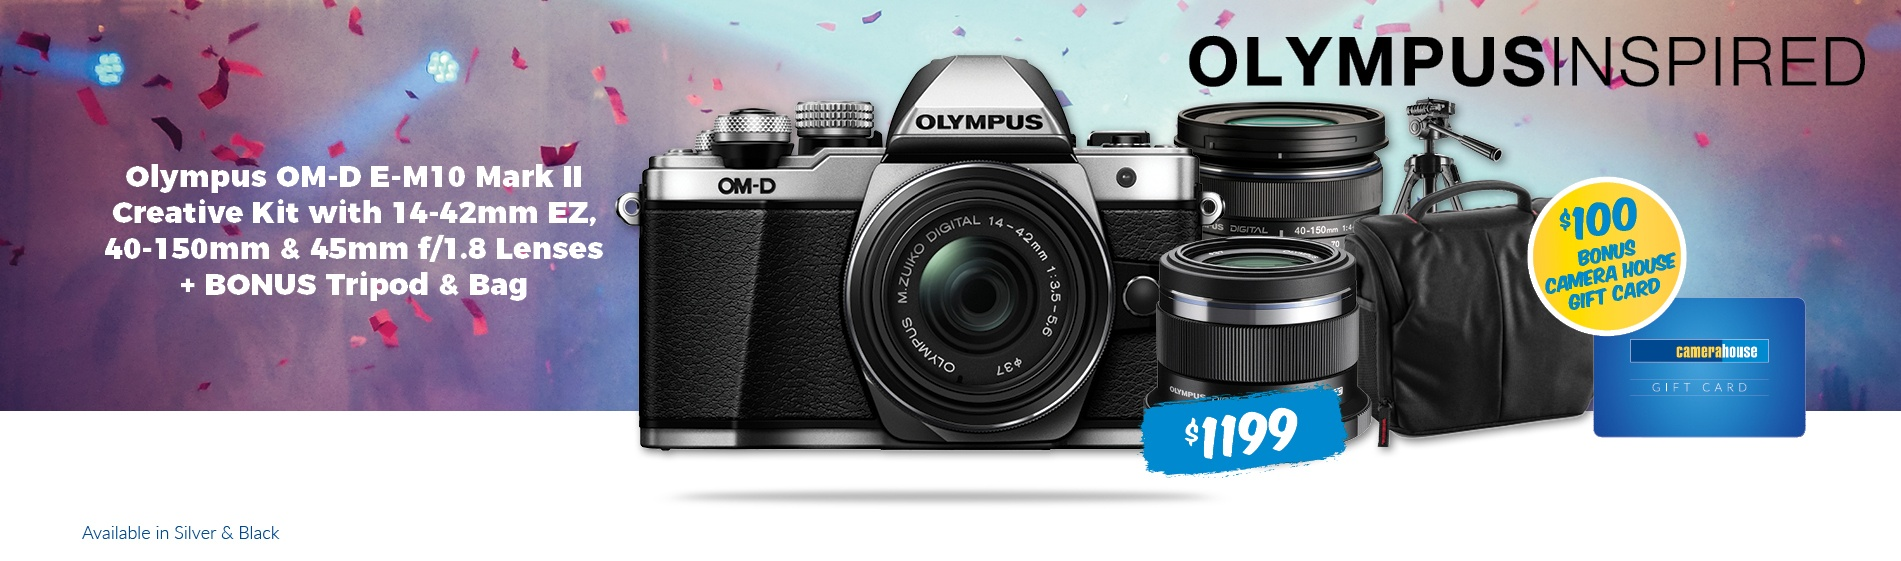 092018_1_Olympus_Catalogue_DesktopCarousel3